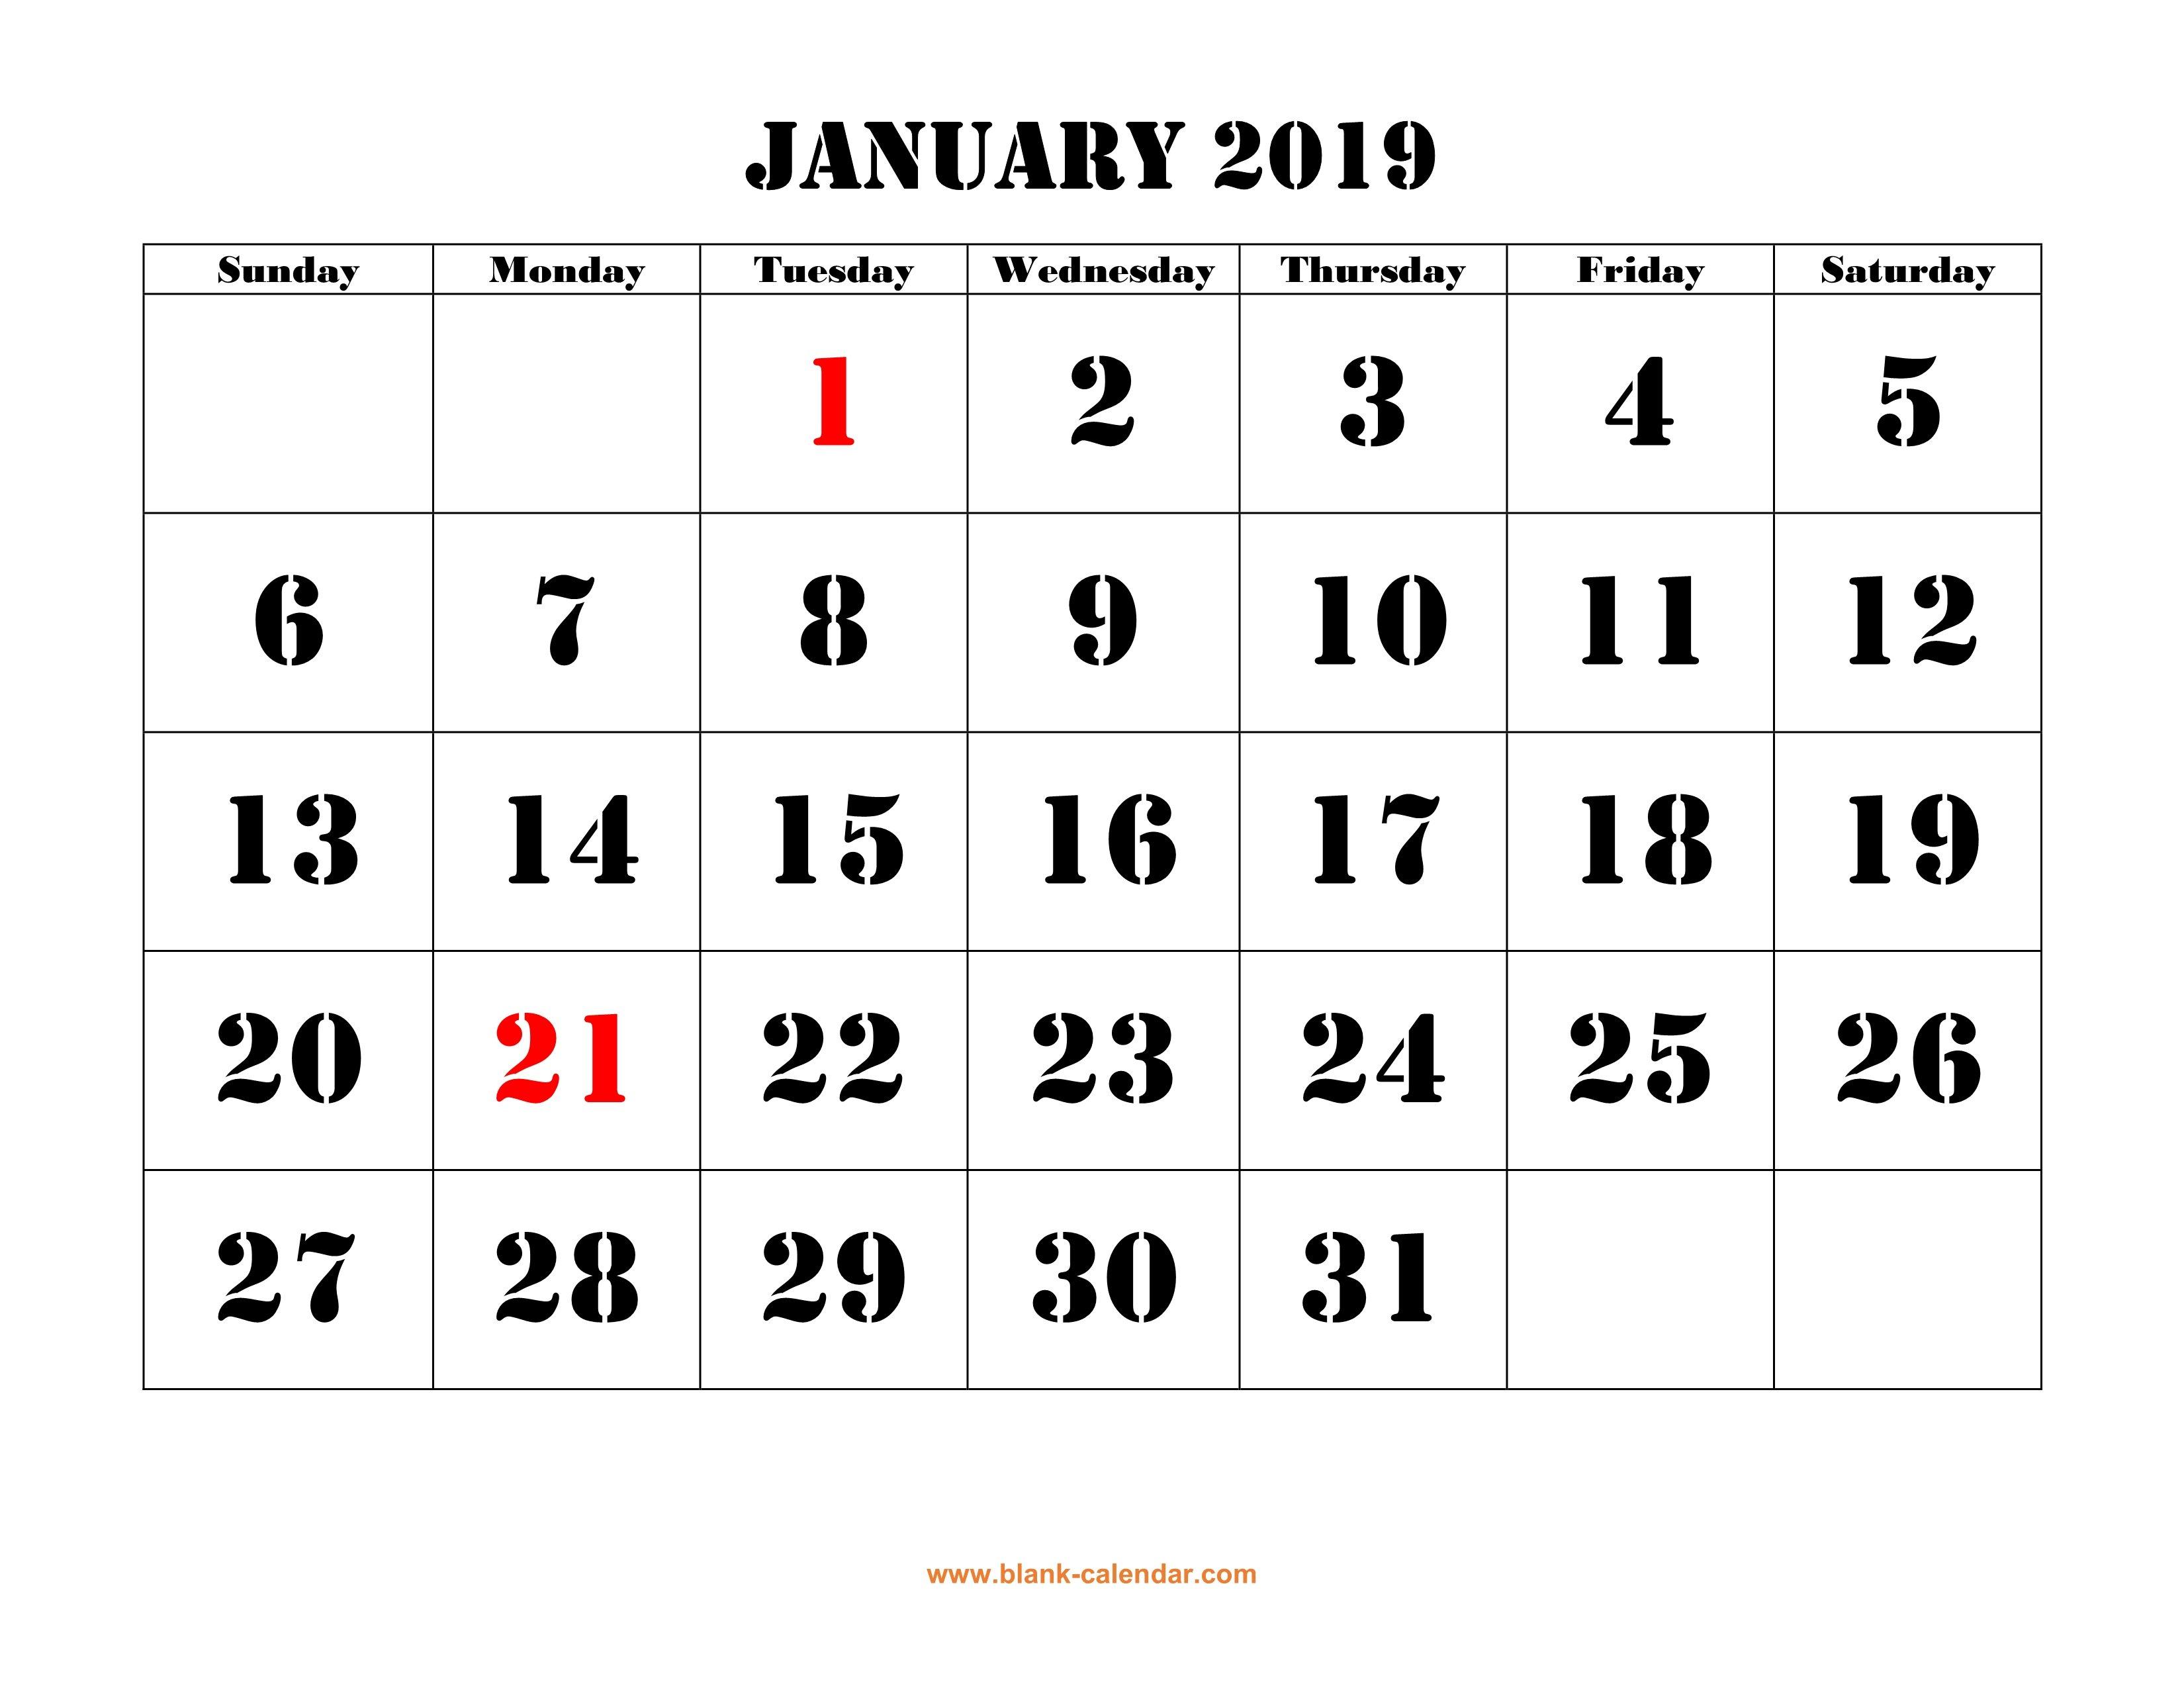 Free Download Printable January 2019 Calendar, Large Font Design Calendar 2019 Large Printable